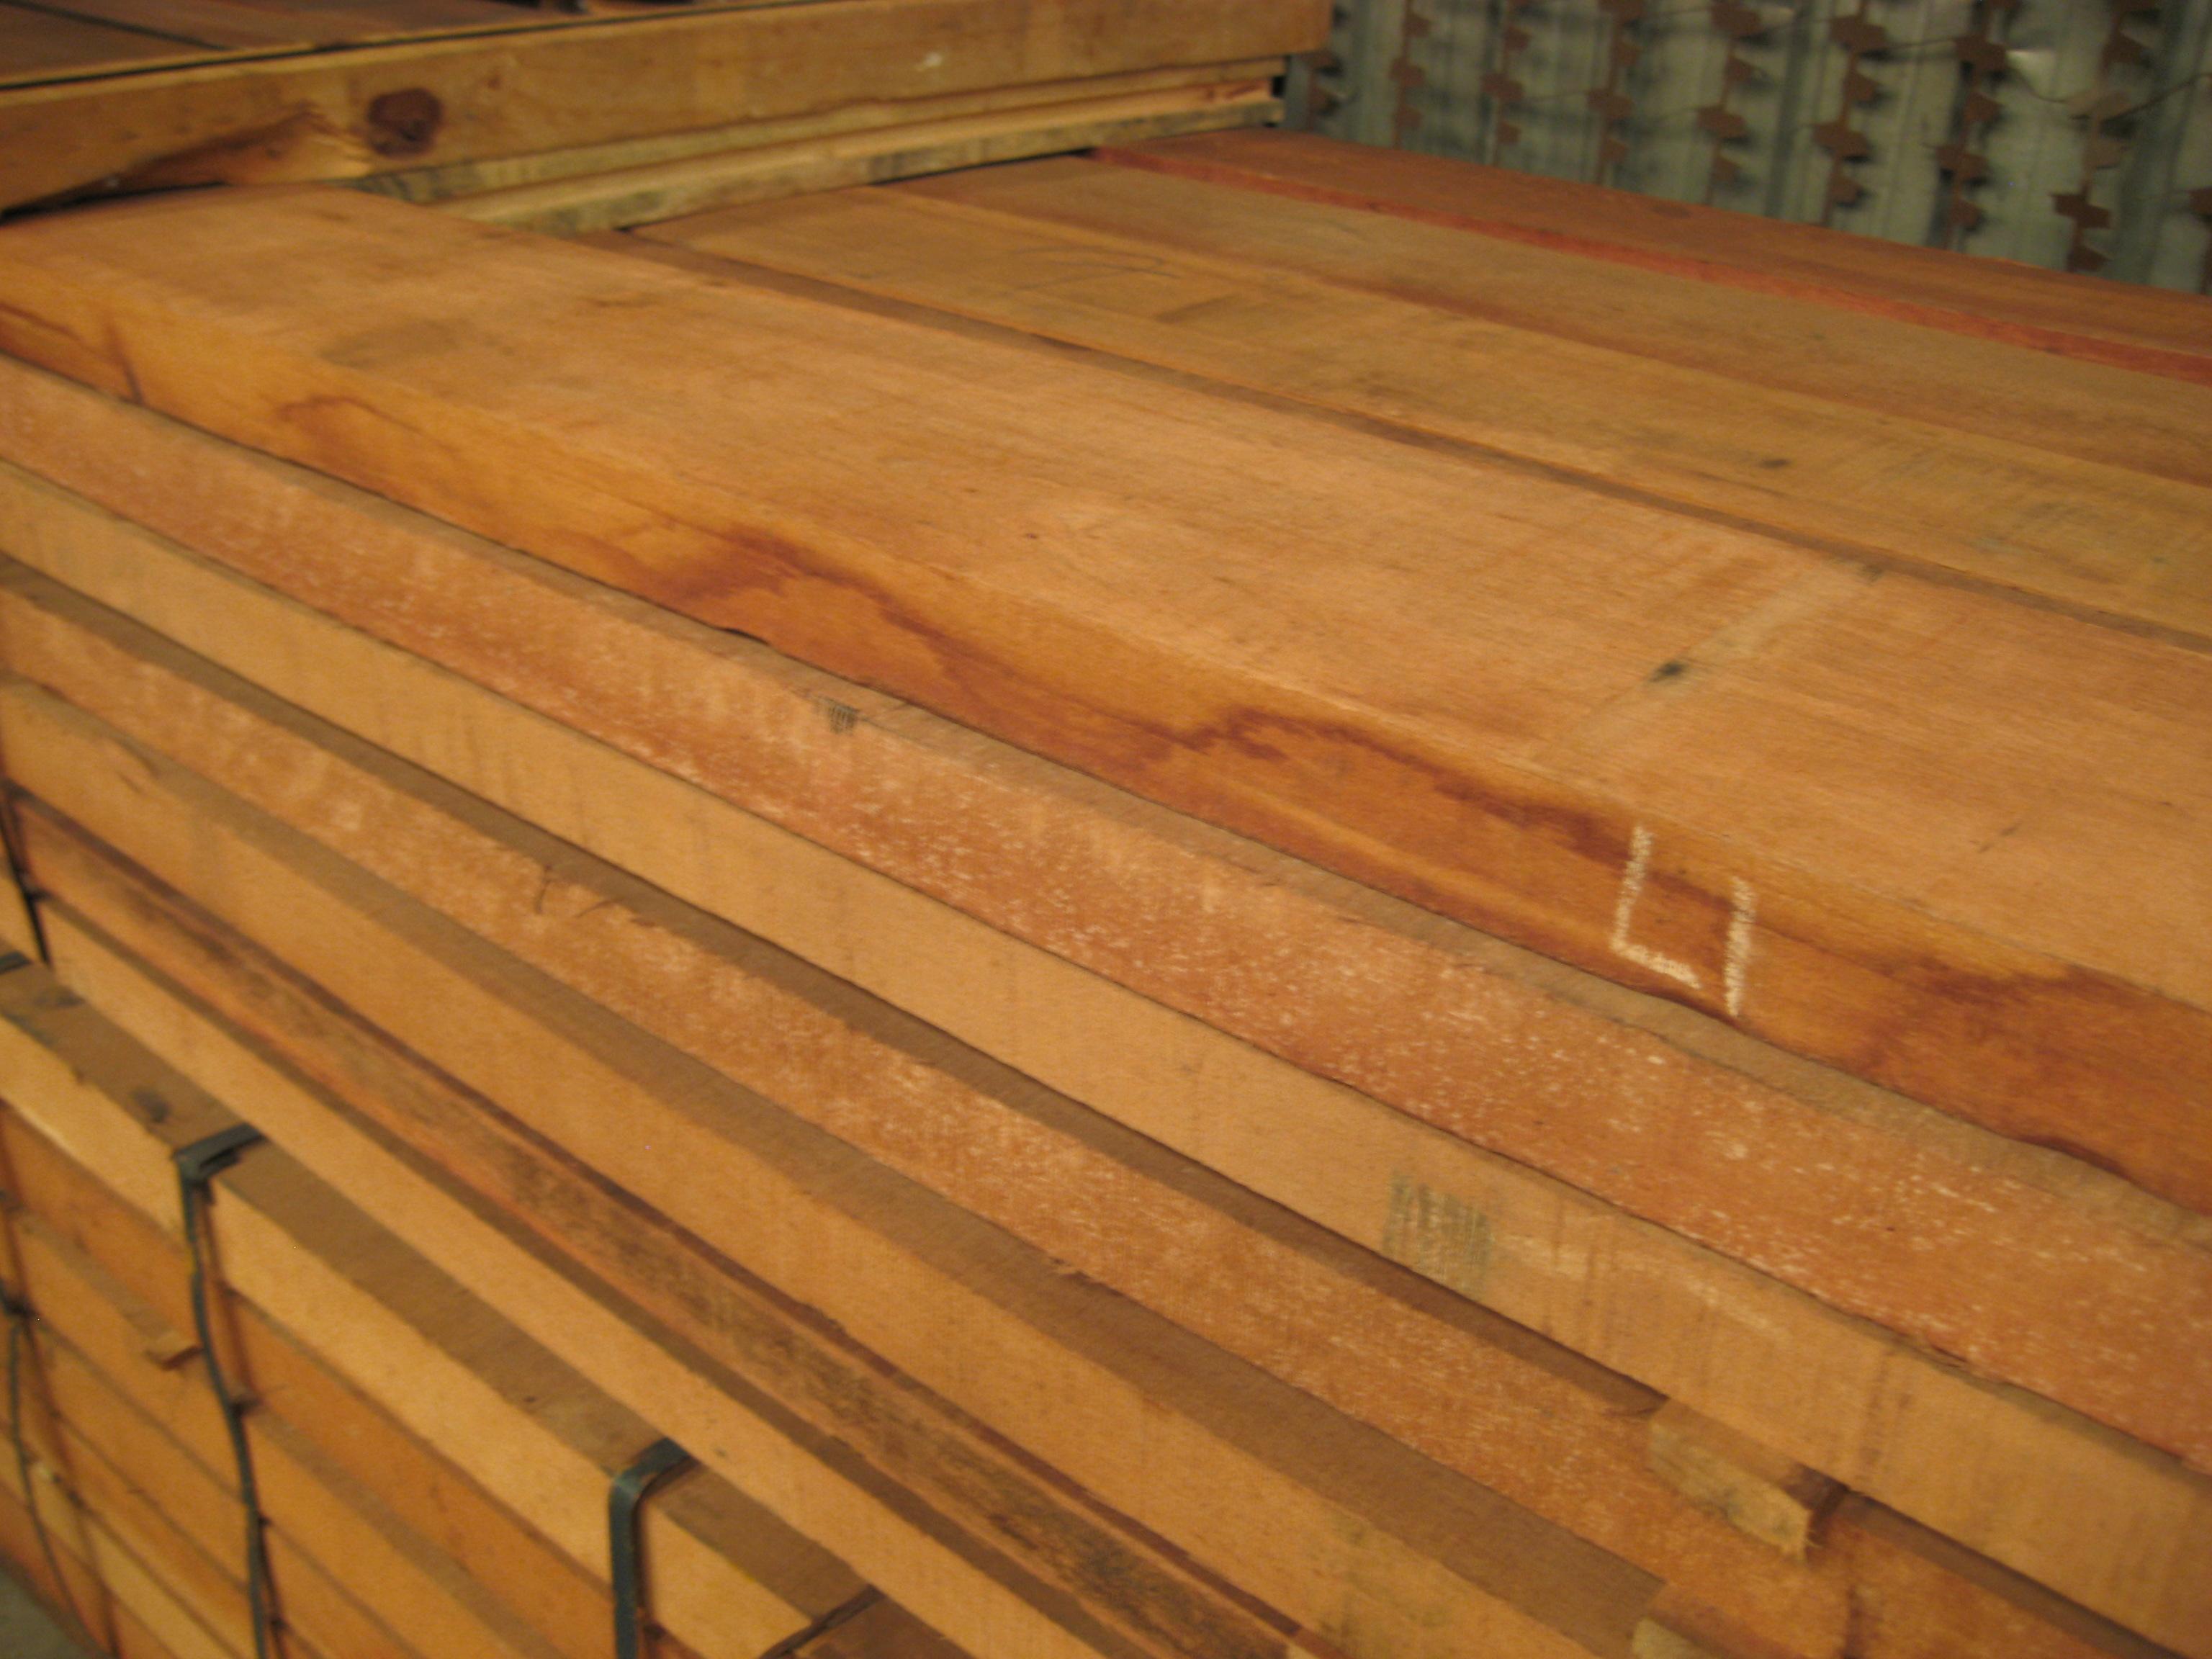 Shiplap floor boards 28 images shiplap flooring for Dinge im wohnzimmer 94